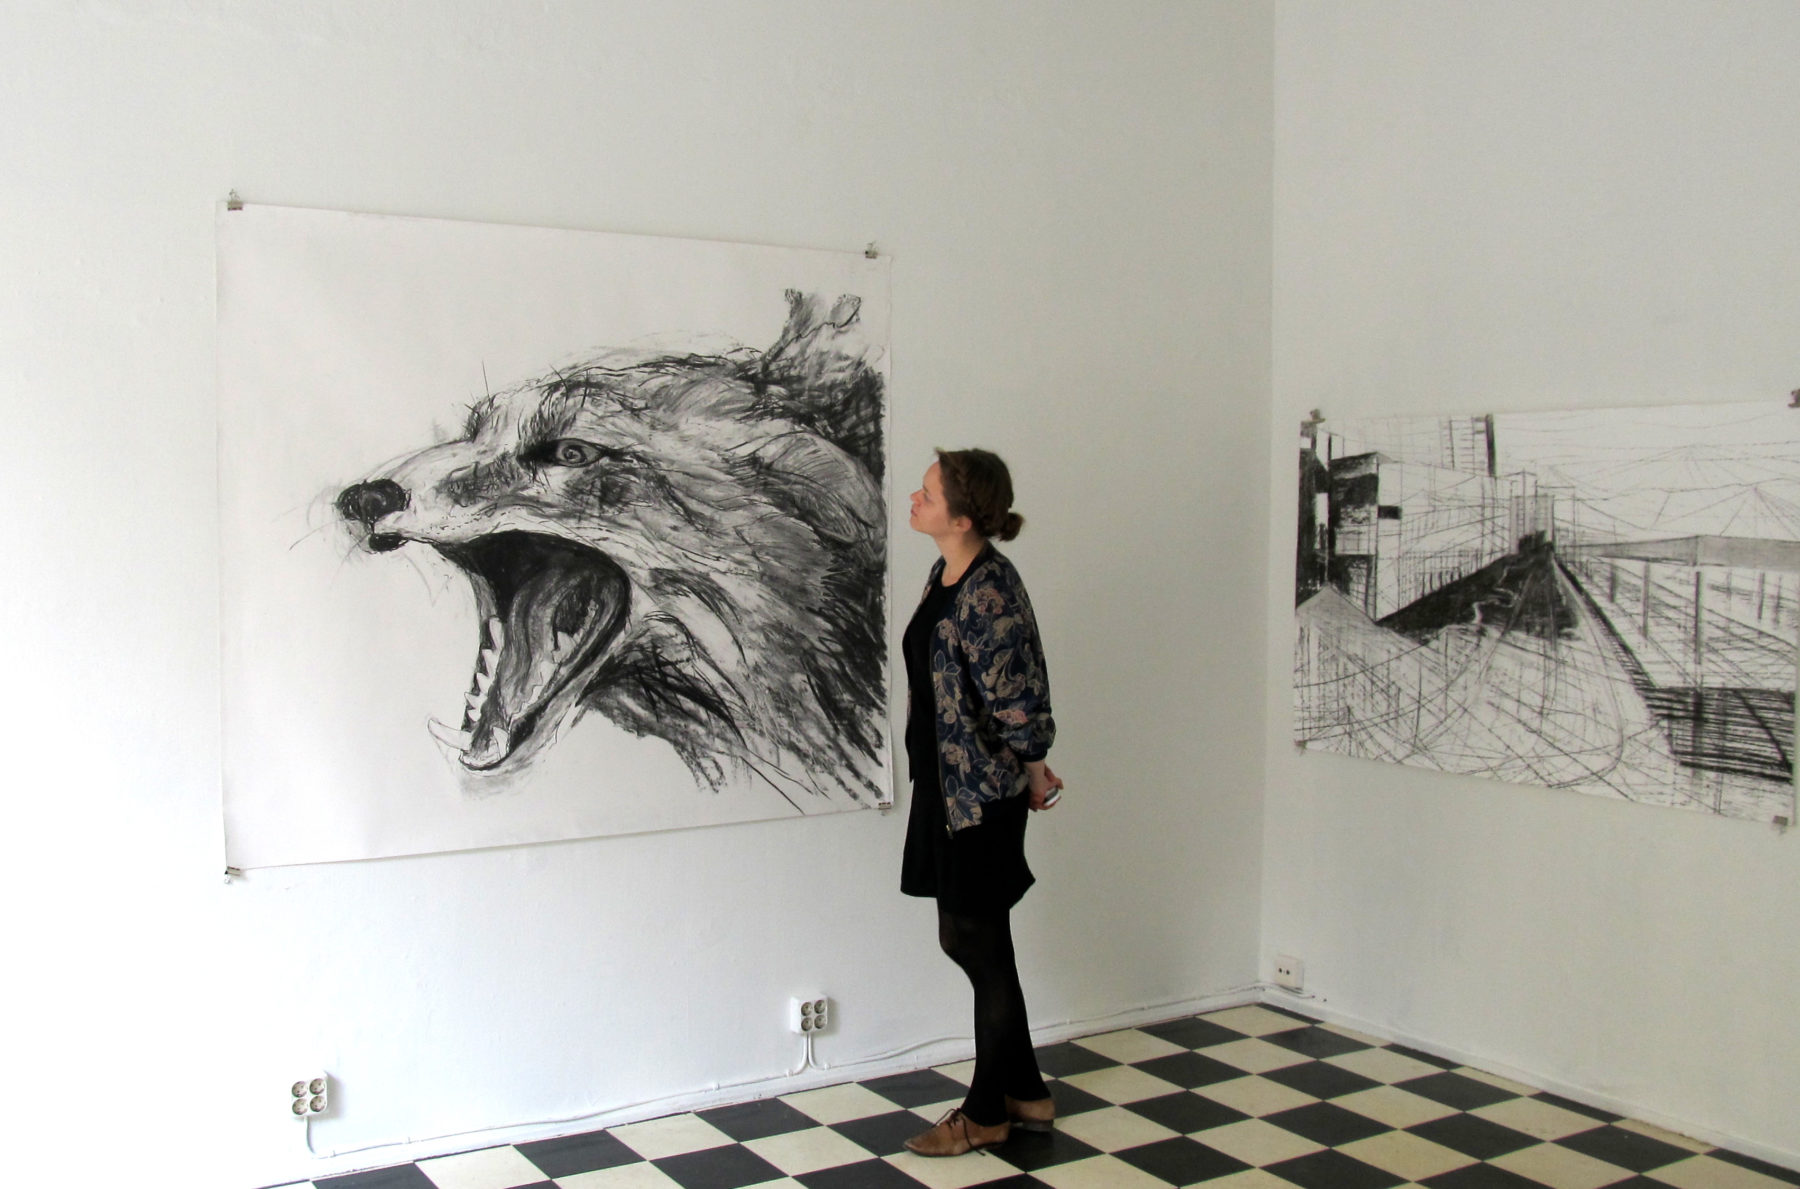 VULPICIDE /CITYCIDE (2013) by Jane Hughes & Taru Kallio installation view at Sorbus Galleria, Helsinki, Finland.